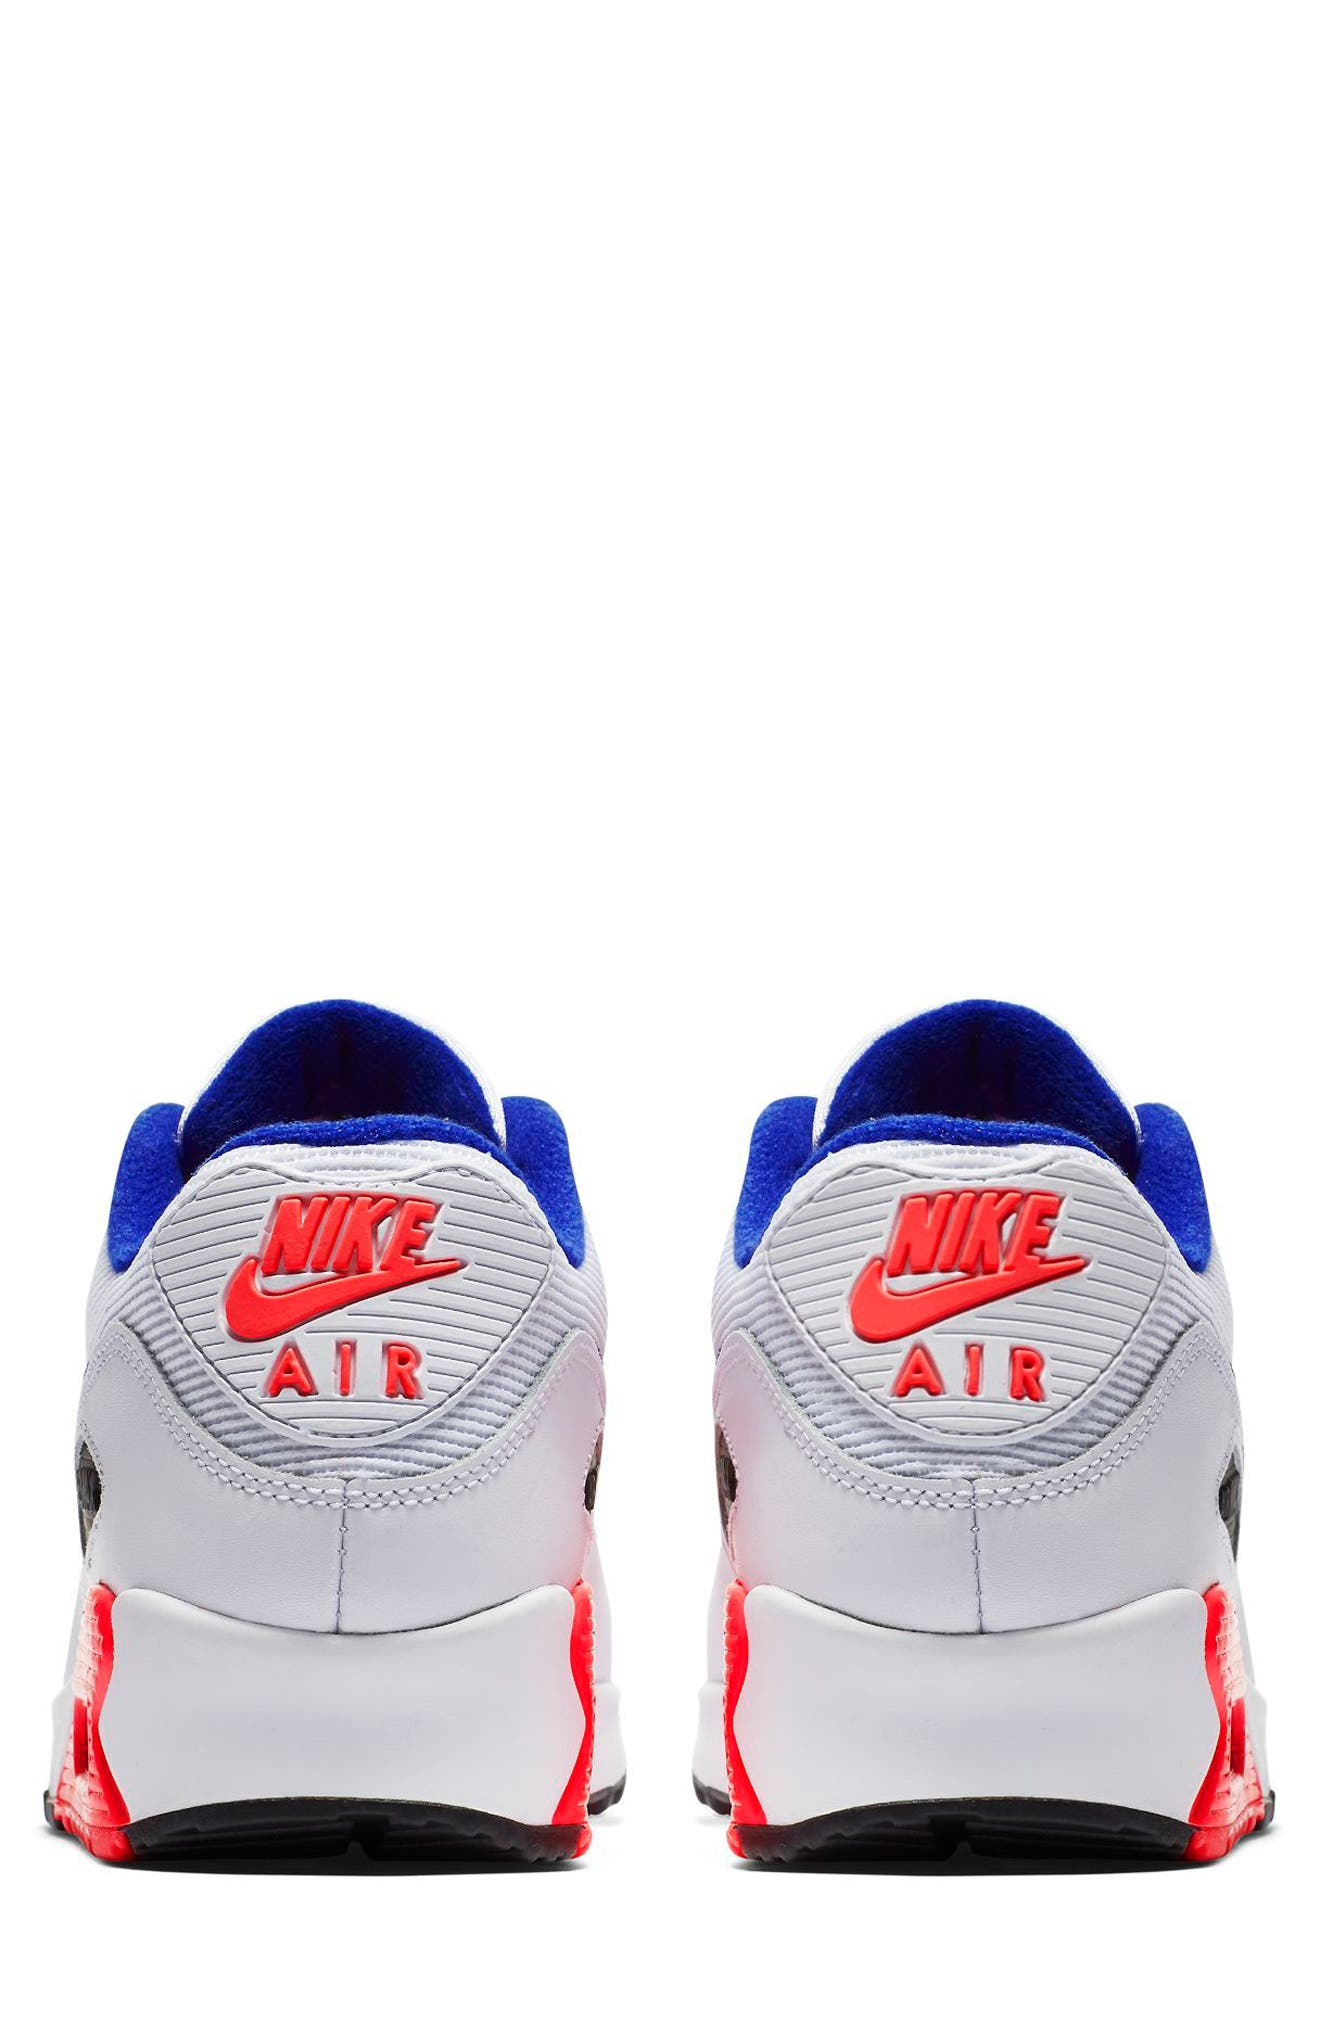 Air Max 90 Essential Sneaker,                             Alternate thumbnail 2, color,                             WHITE/ ULTRAMARINE